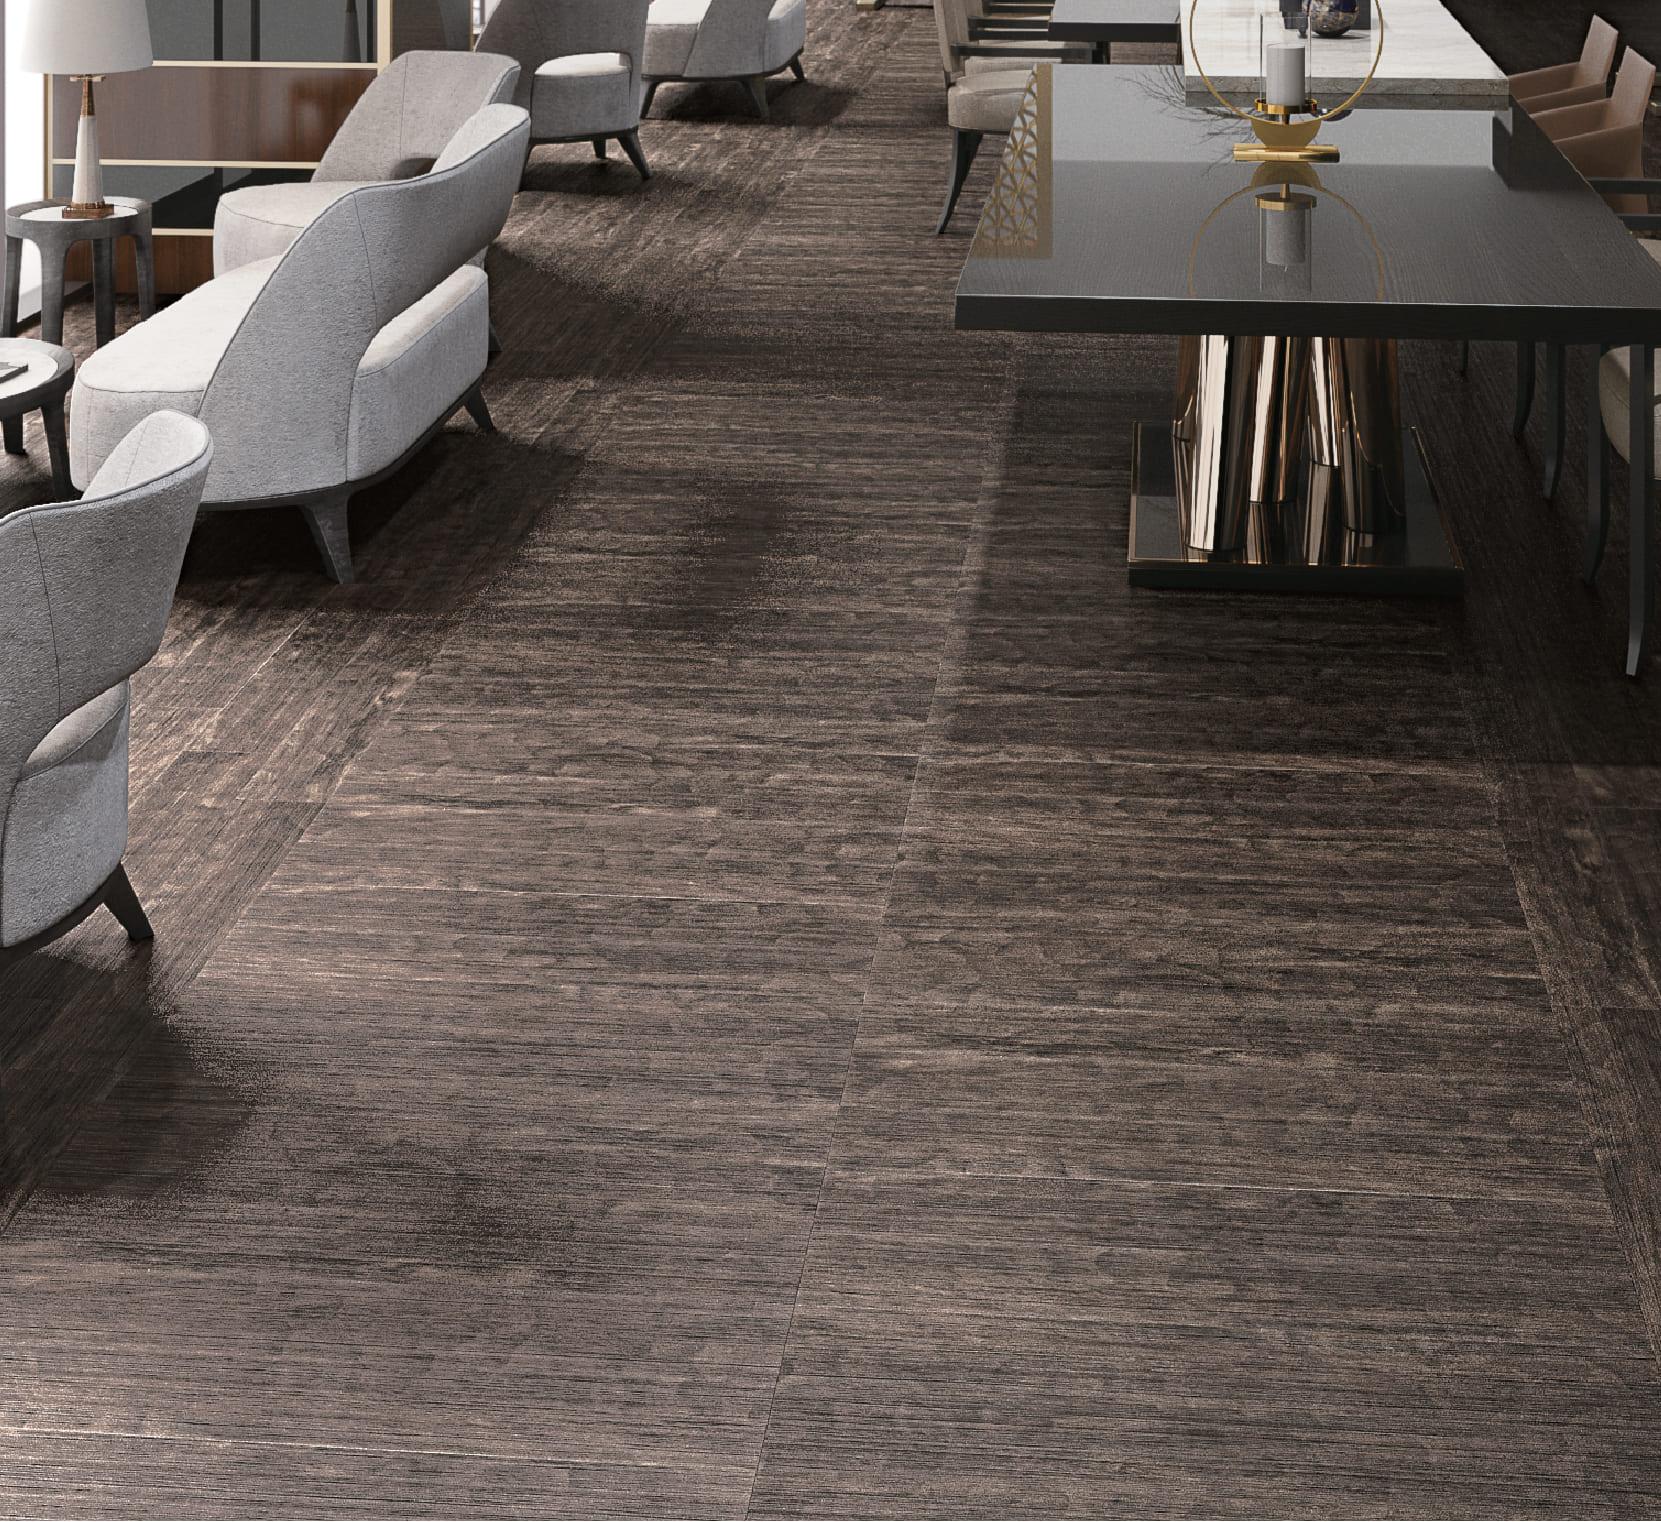 Tat Ming Flooring